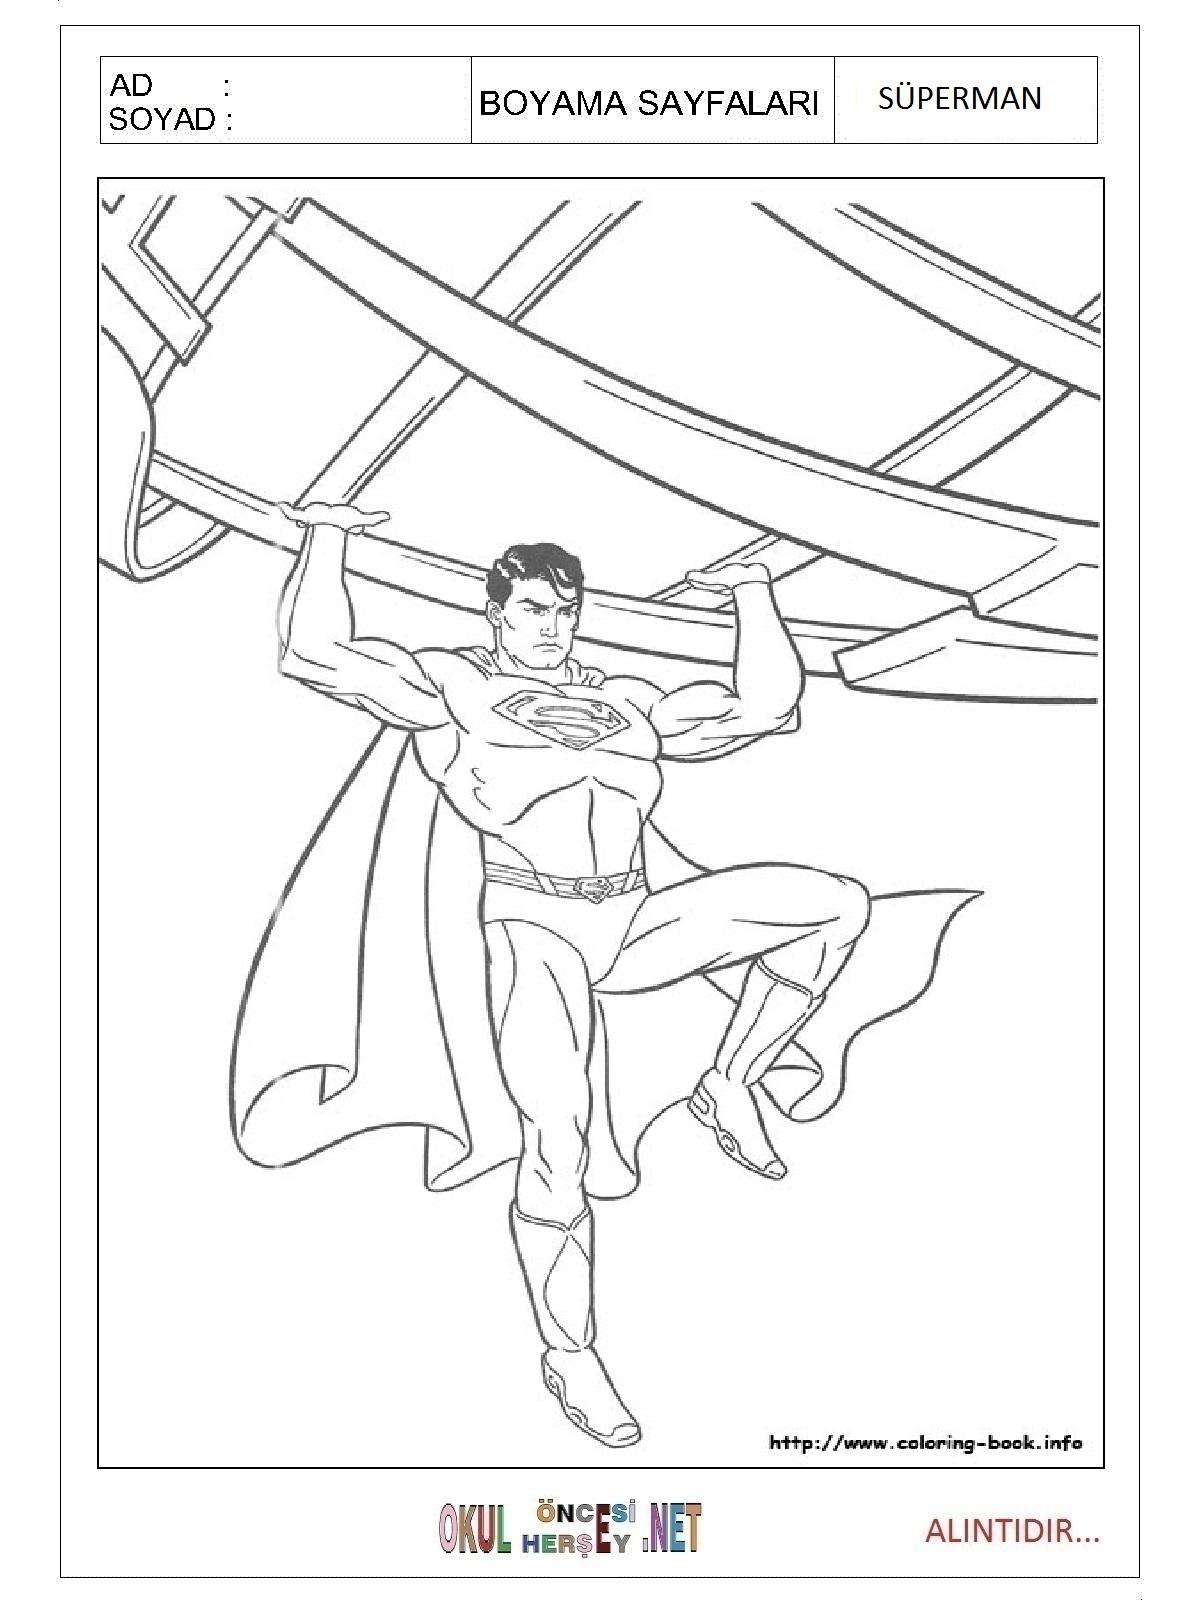 Superman Boyama Sayfalari